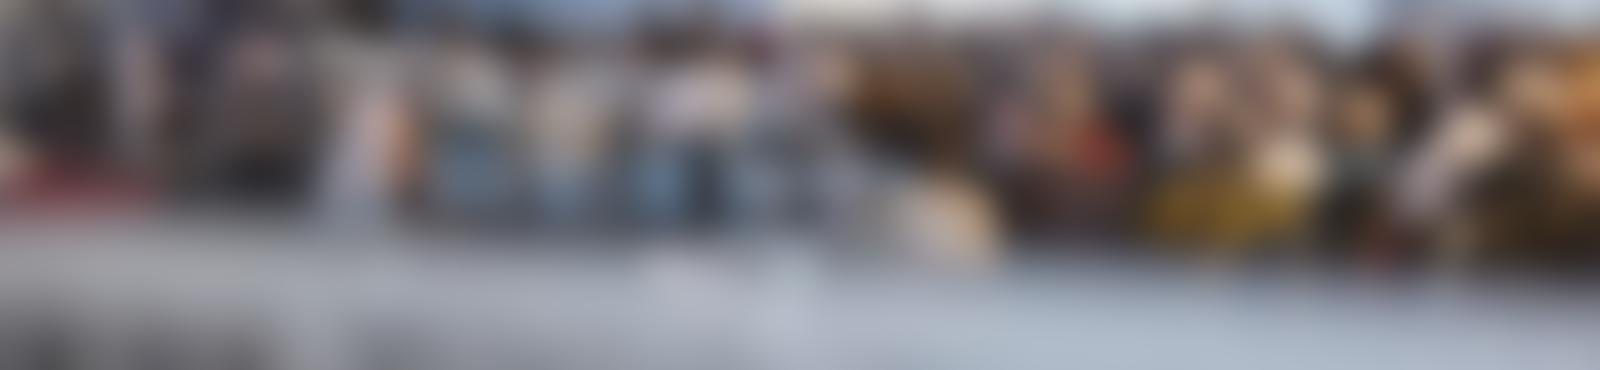 Blurred 9fc62c92 0b89 4566 a04e fa09f8eda6af